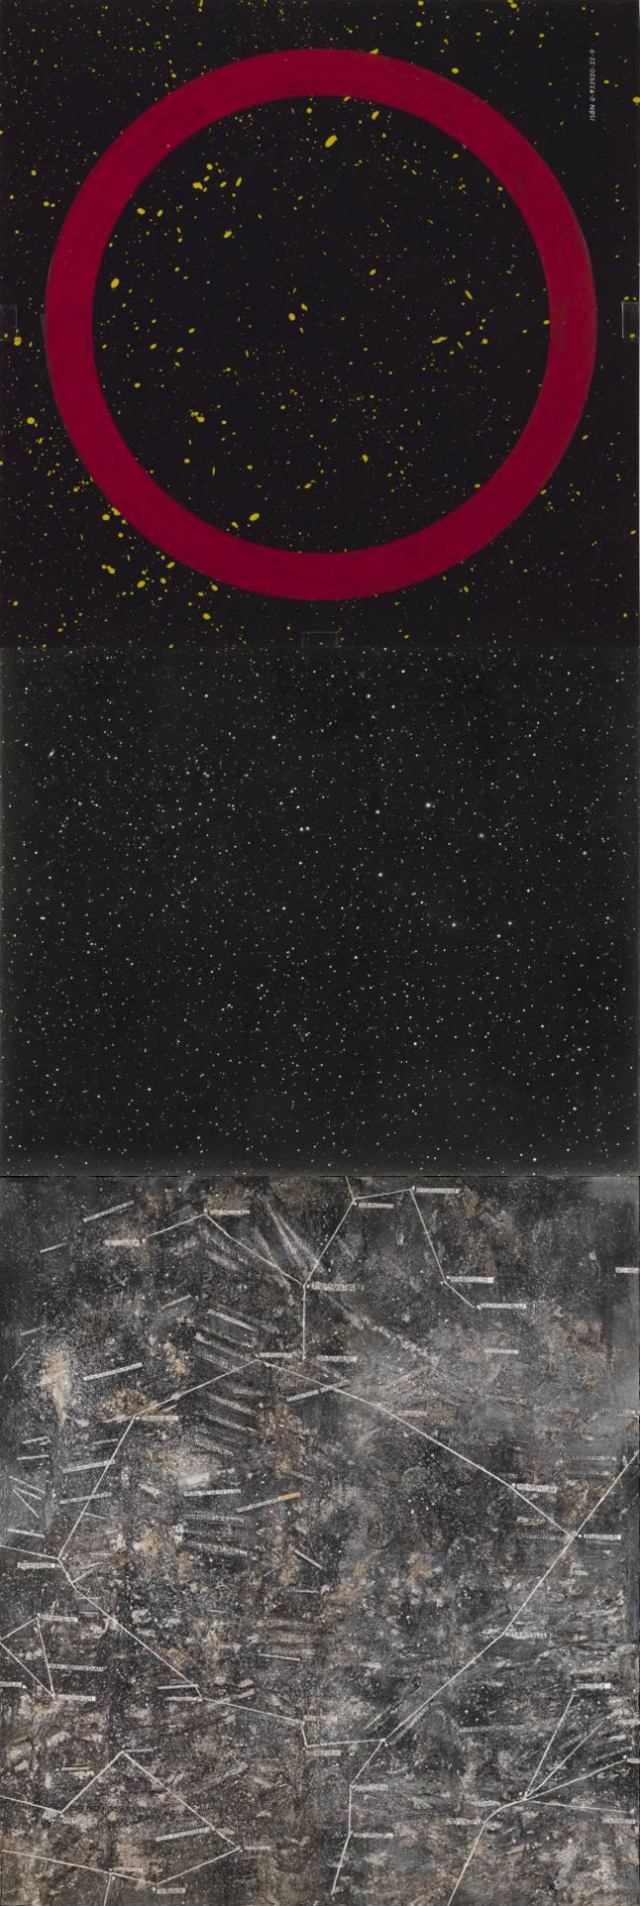 Edward Ruscha + Vija Celmins + Anselm Kiefer